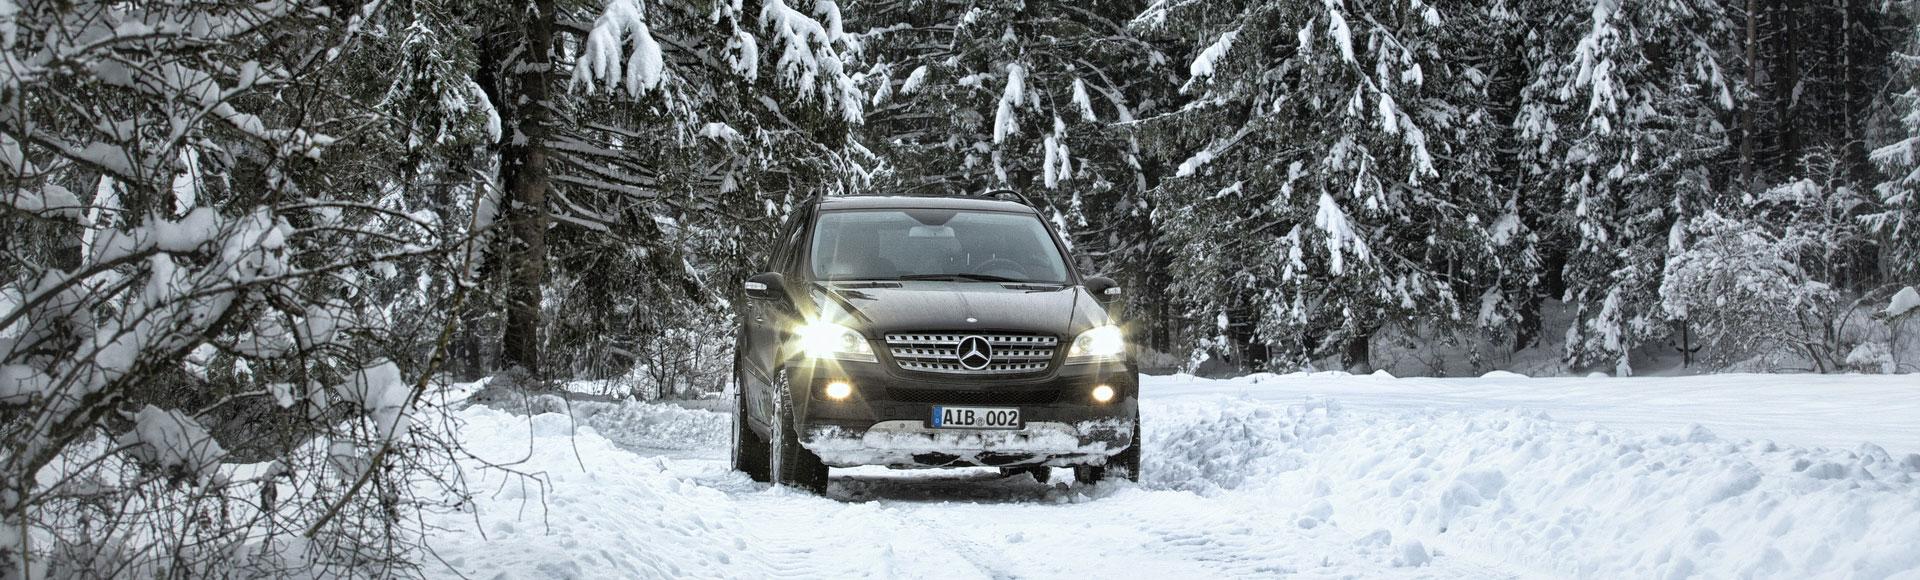 Mercedes Benz ML 2014 Winter 36